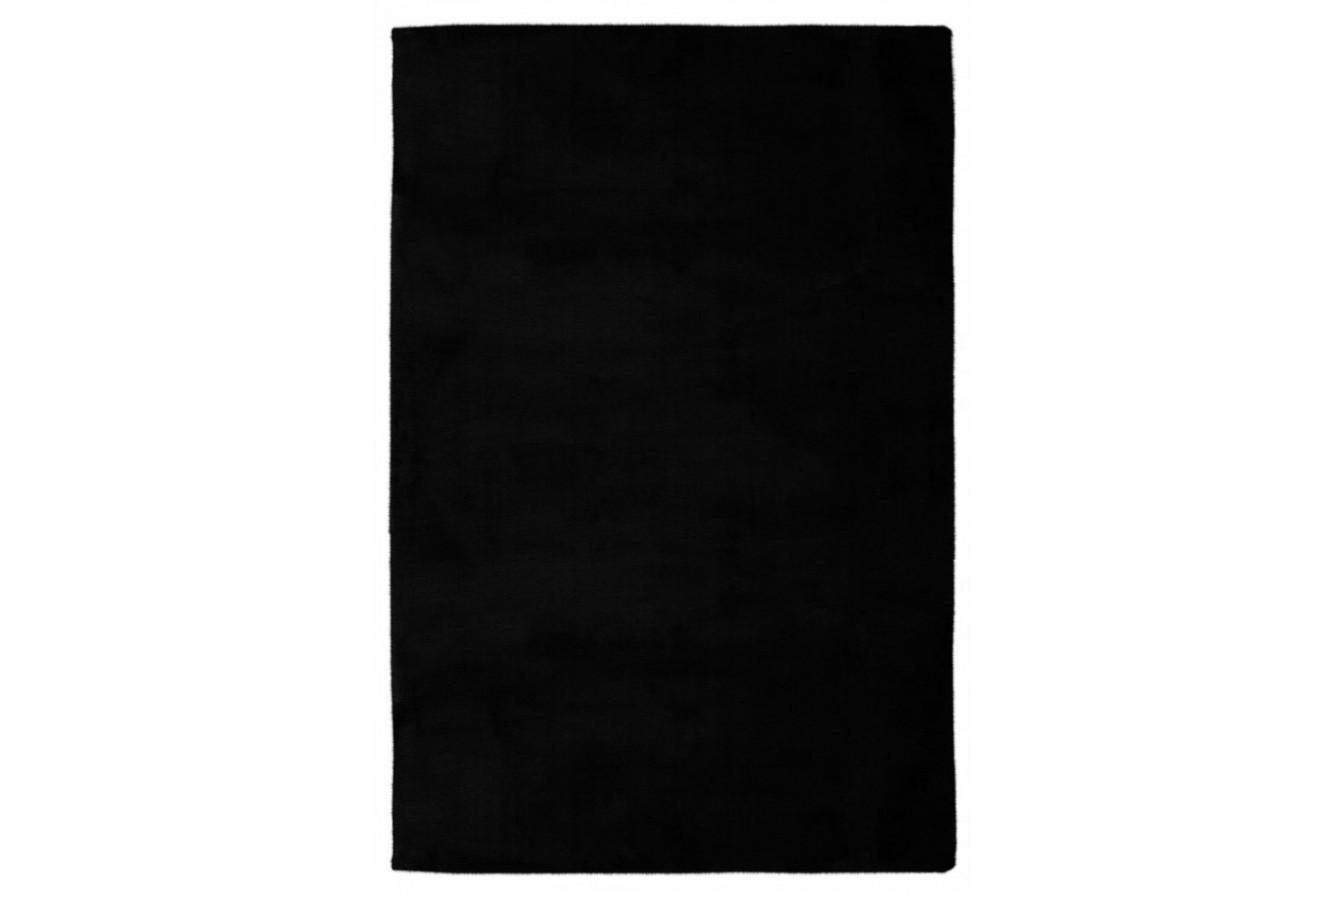 Sztuczne Futro Czarny Dywan Obsession Cha Cha 535 Black